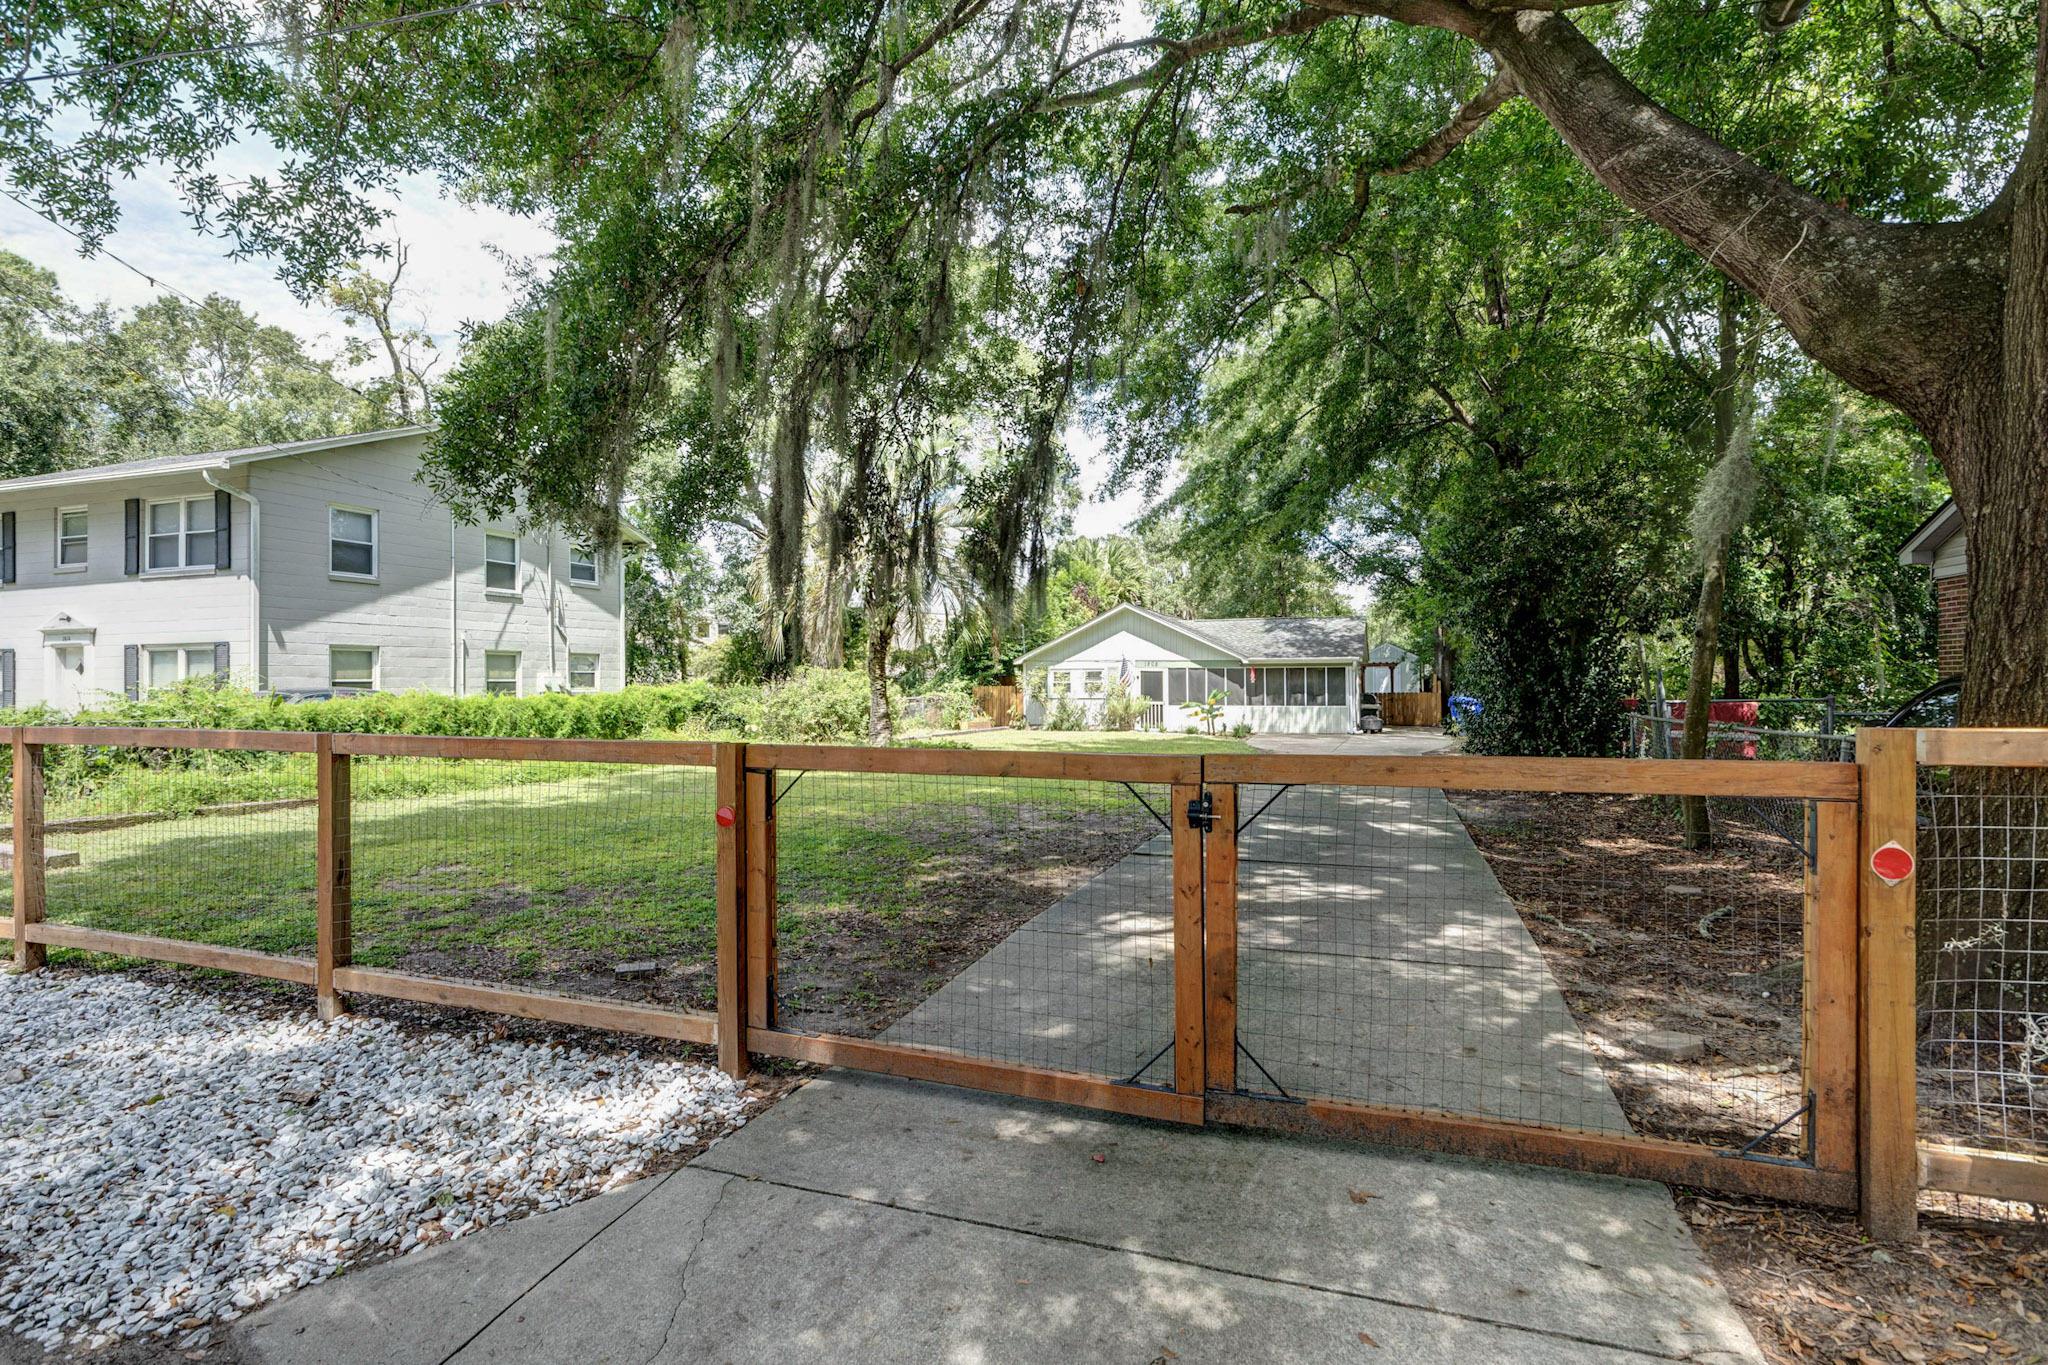 St Andrews Homes For Sale - 1808 2nd, Charleston, SC - 1